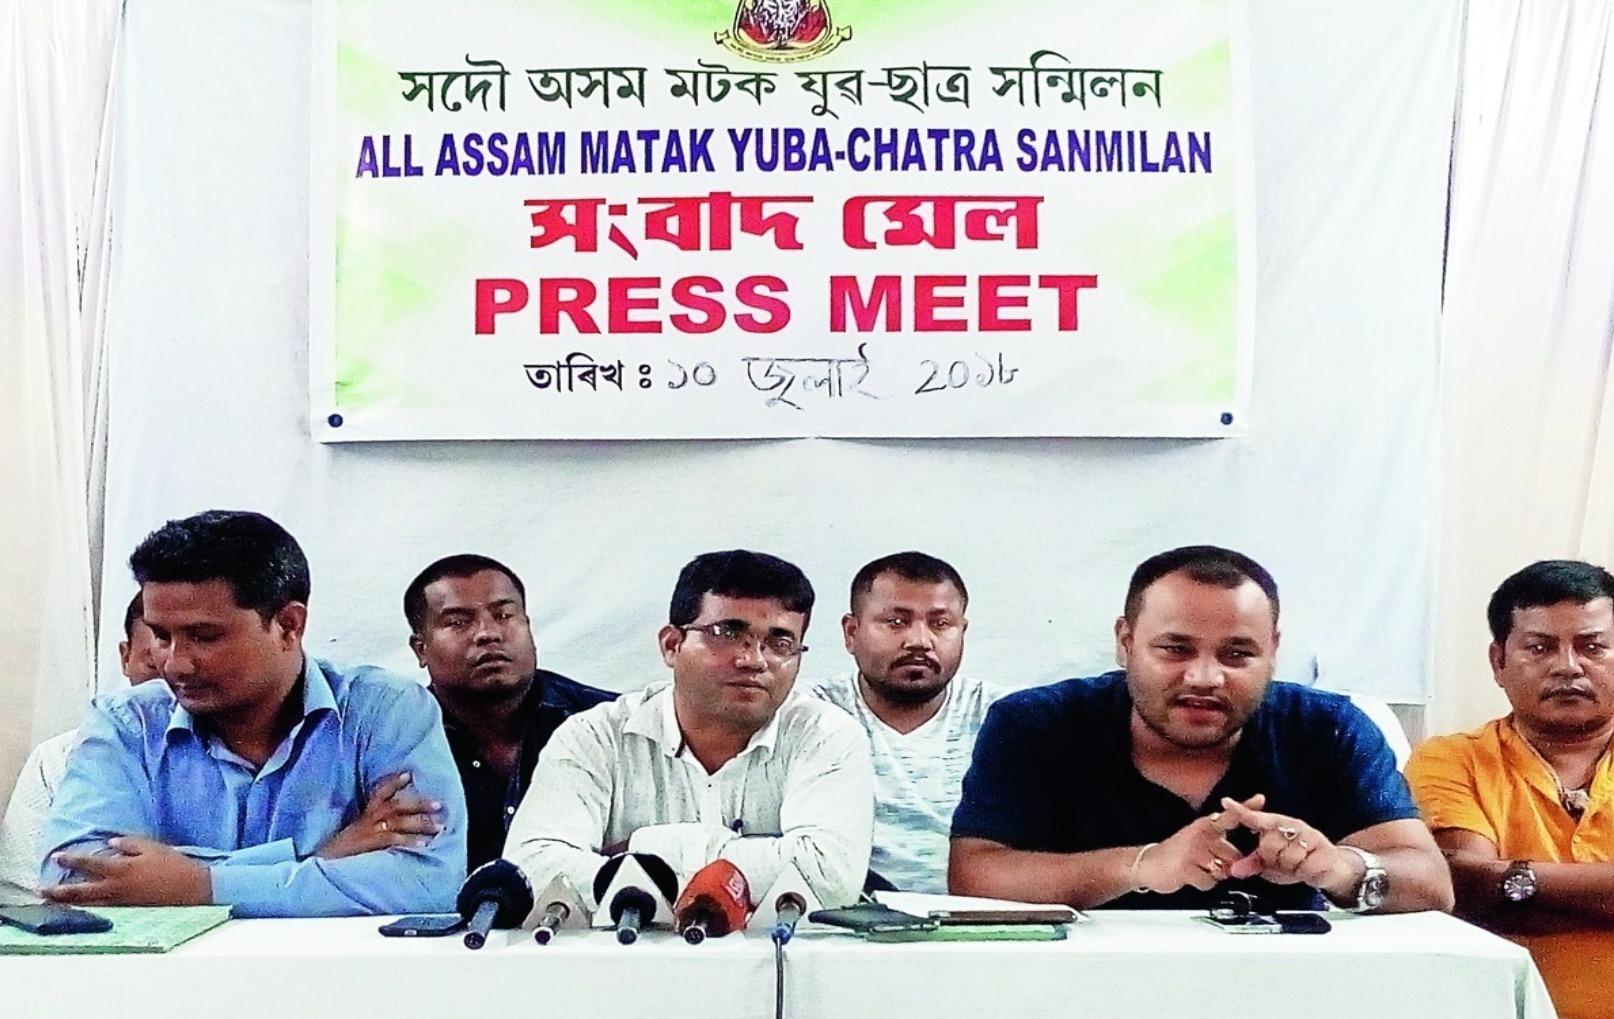 All Assam Matak Yuva Chatra Sanmilan calls for 48 hour economic blockade